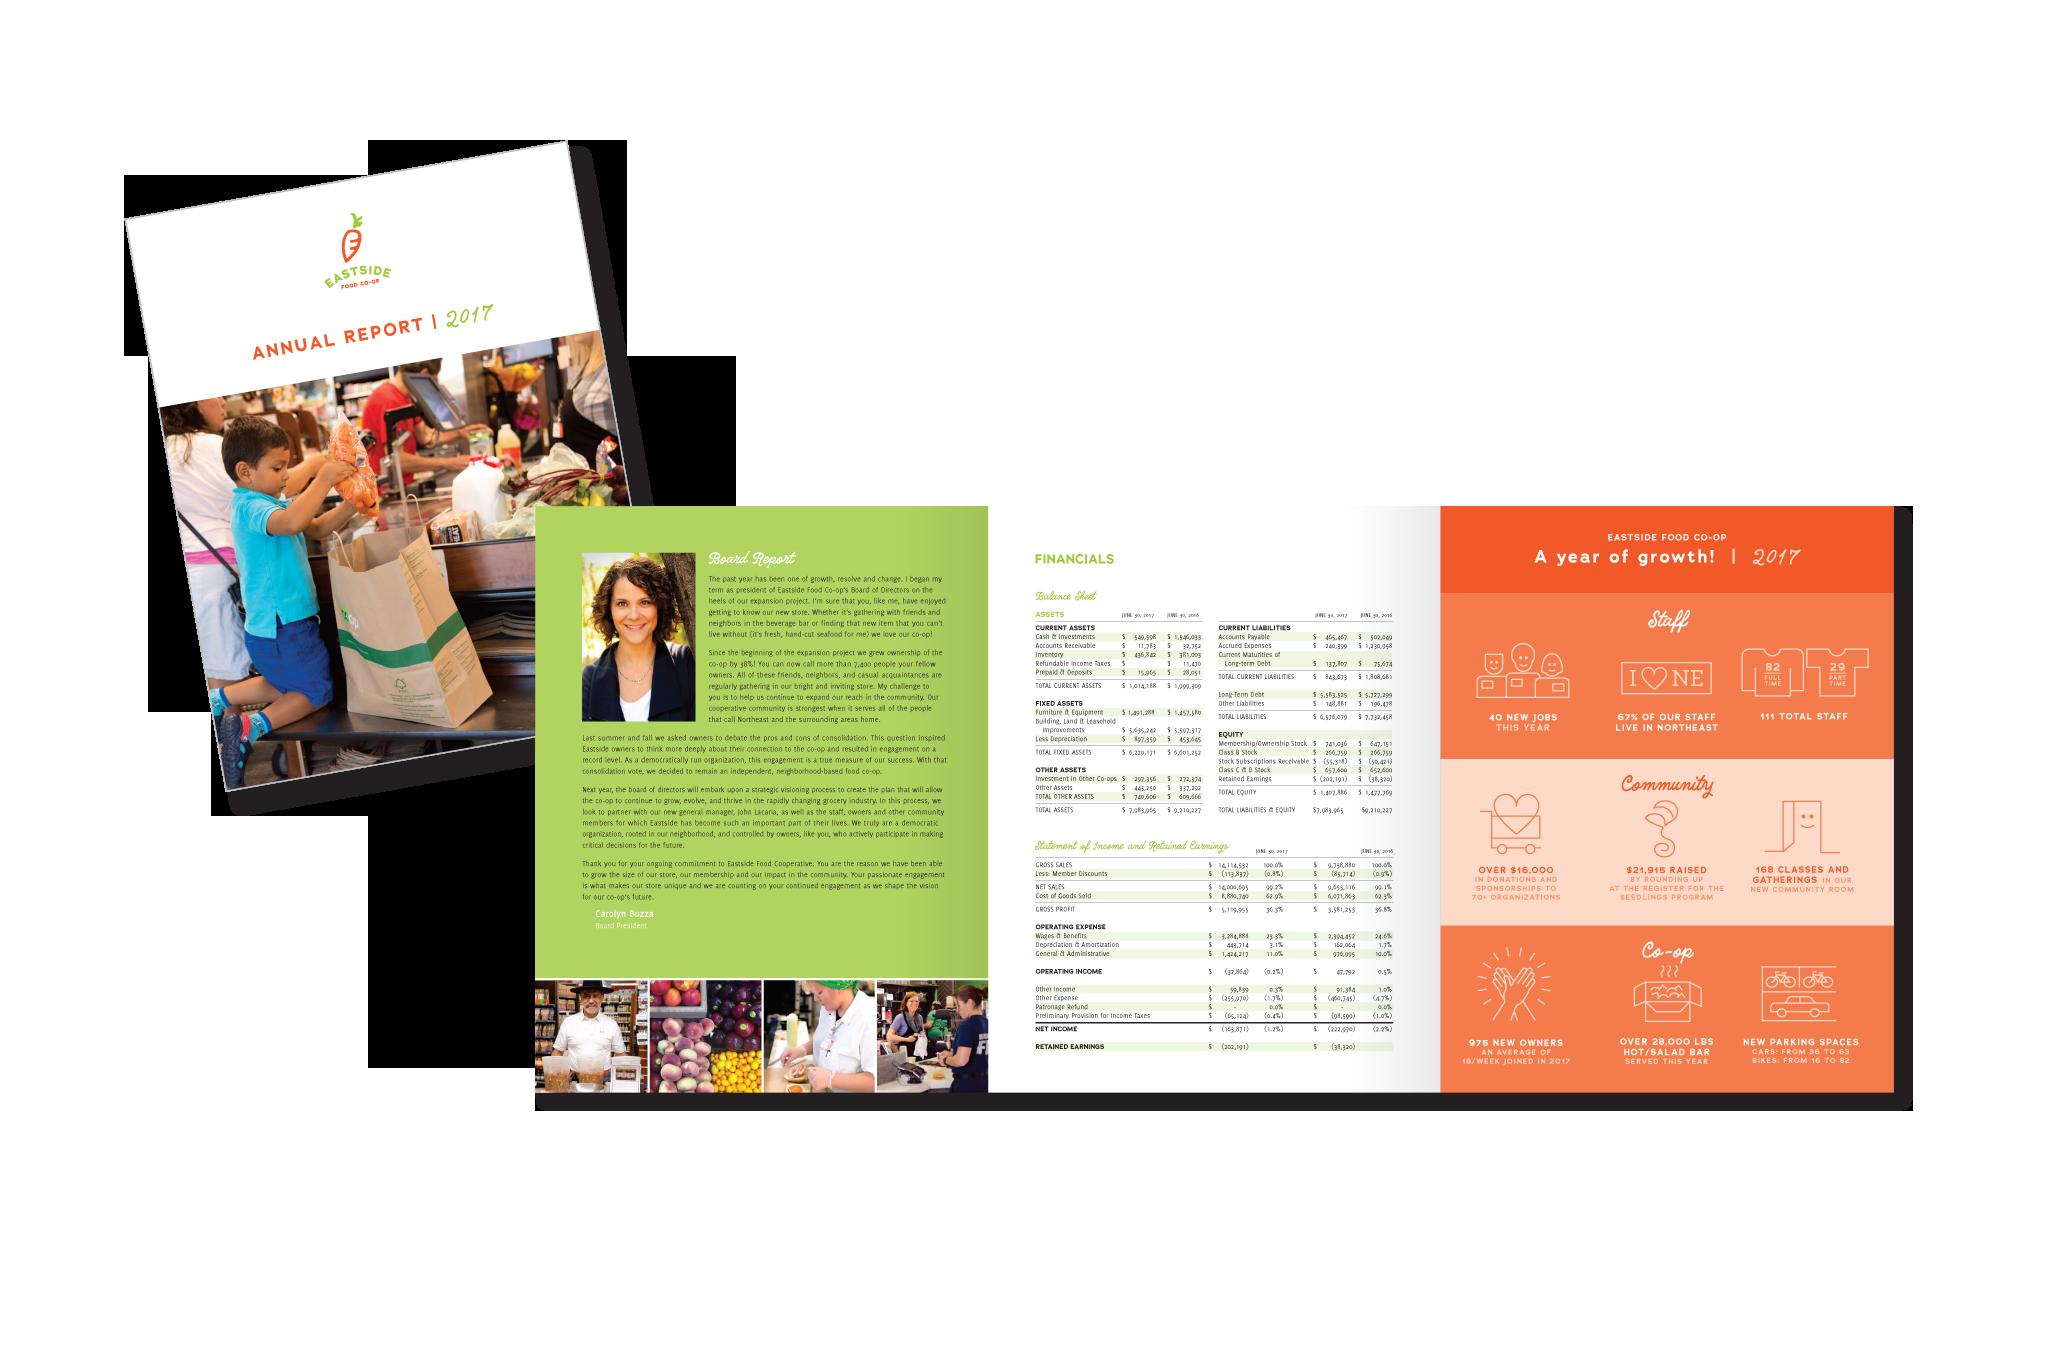 Eastside Food Co-op 2016 annual report